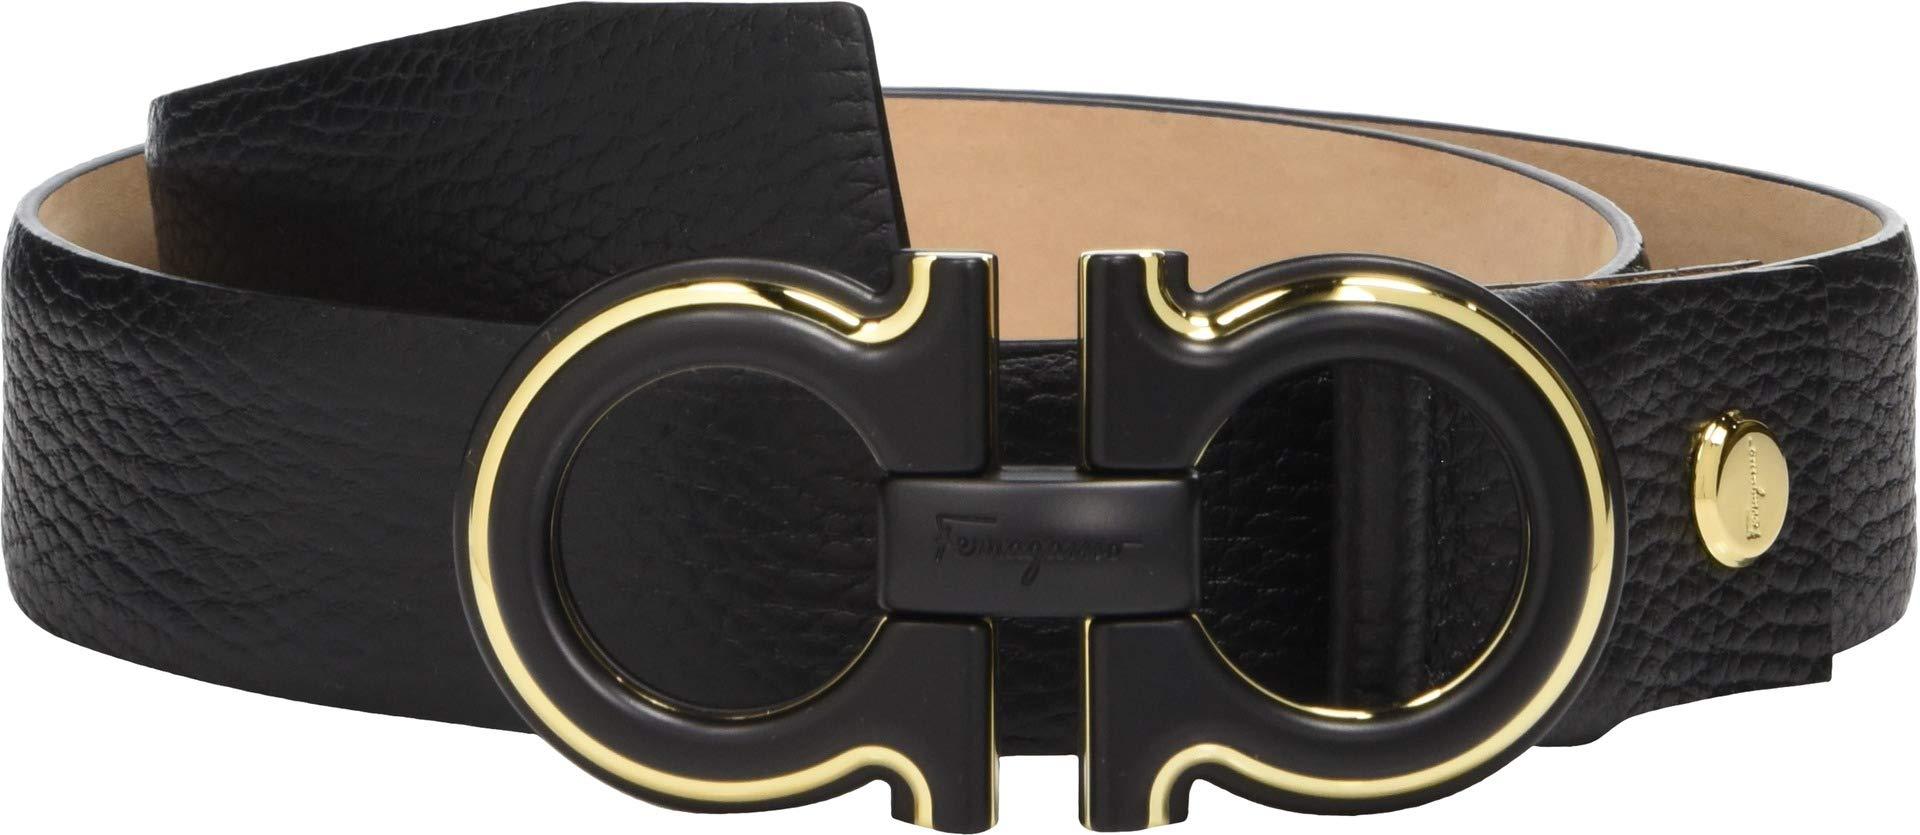 Salvatore Ferragamo Men's Adjustable Belt - 67A005 Black 1 36